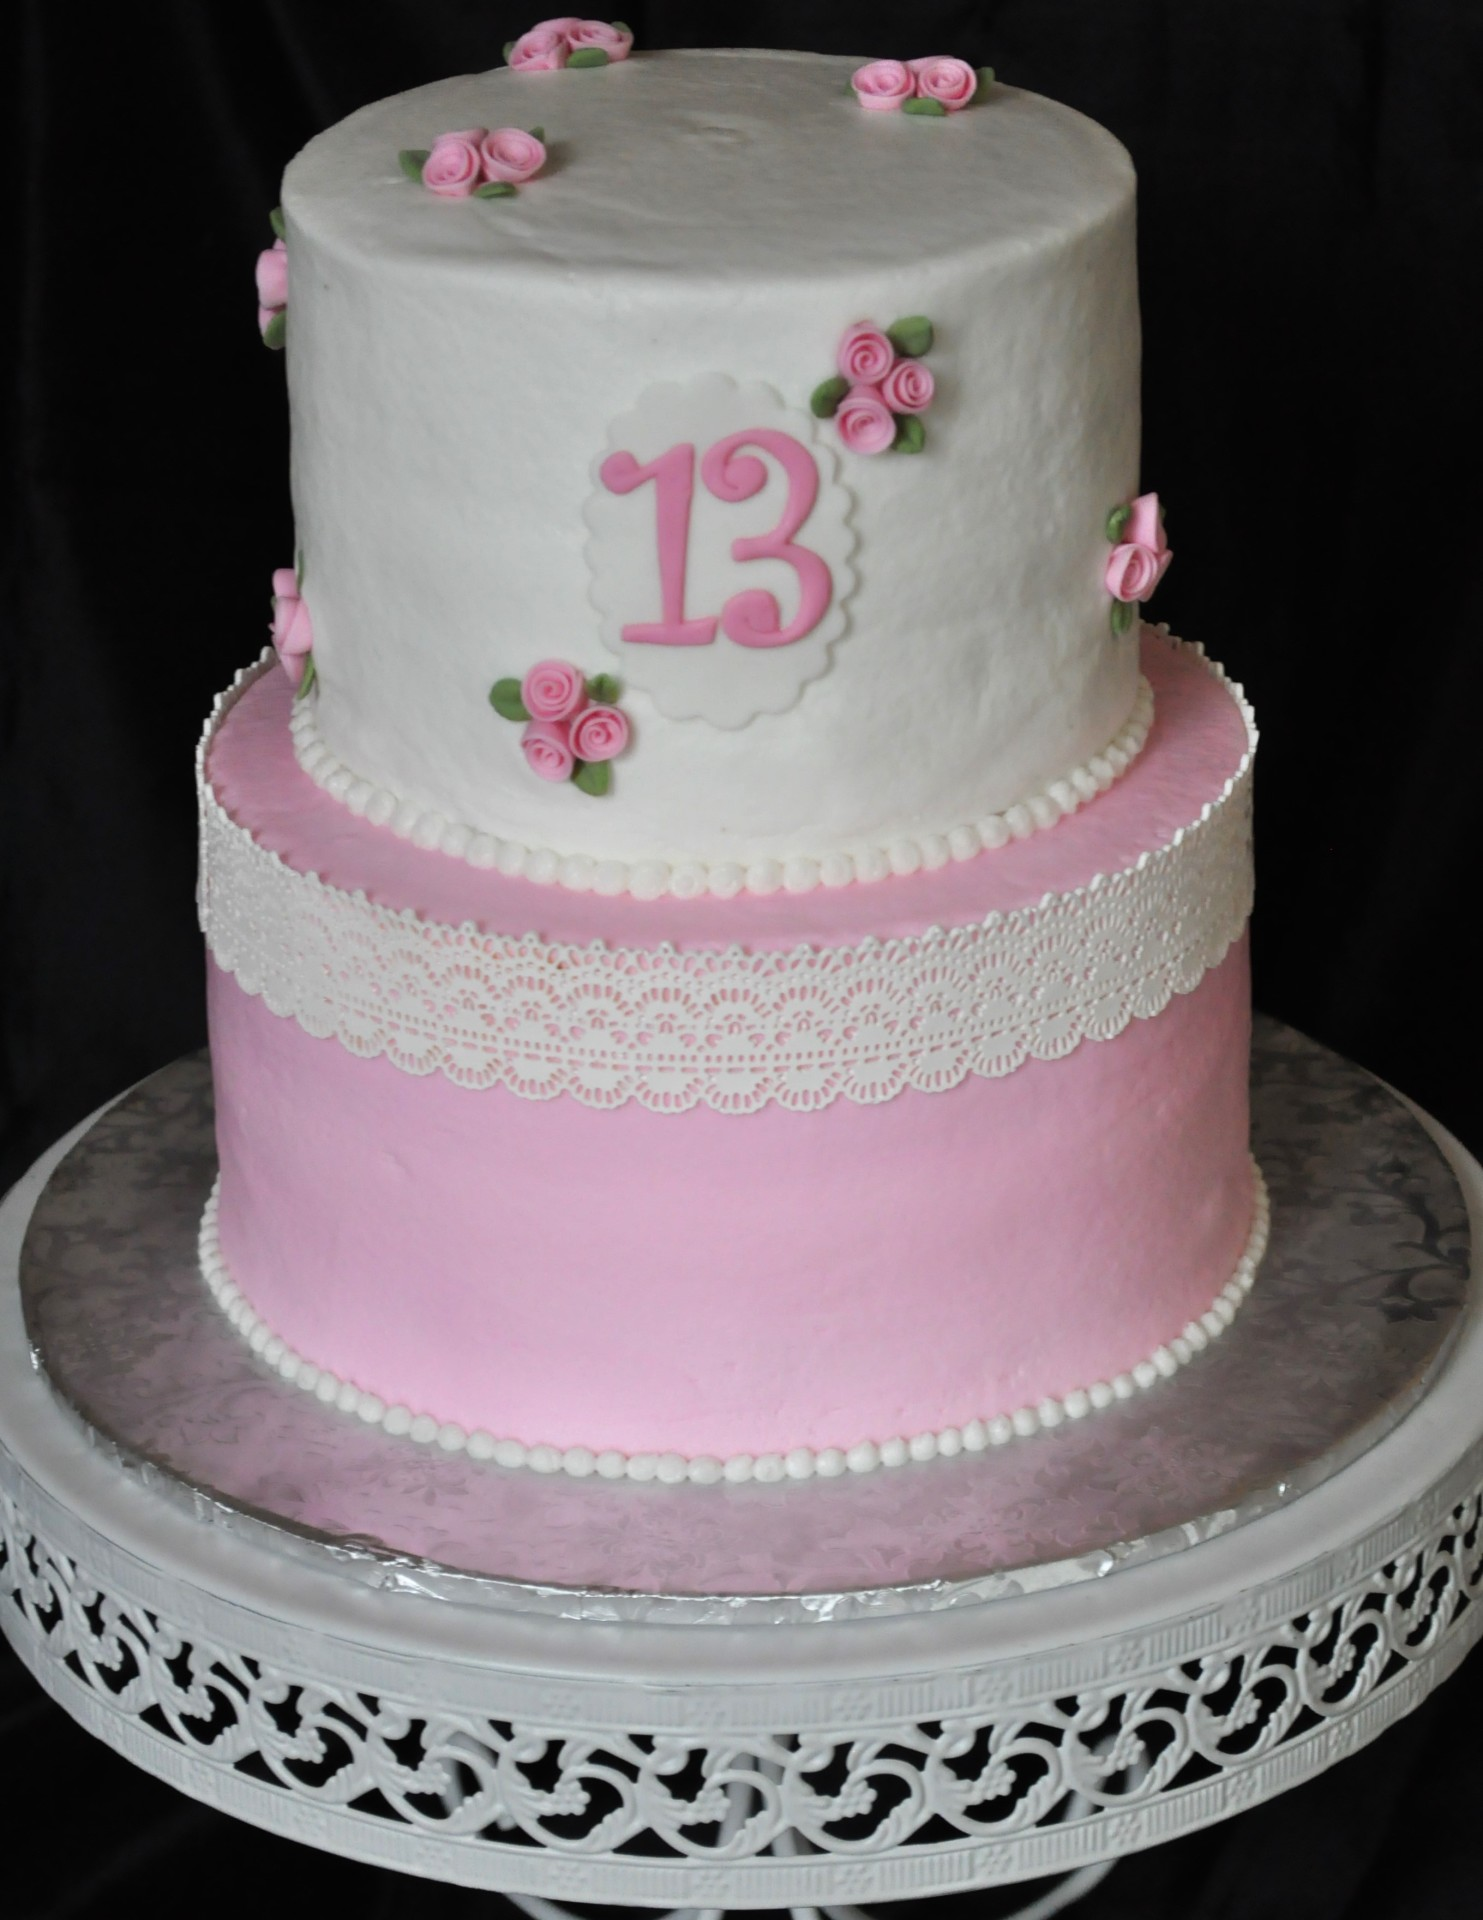 Shabby Chic cake, 13th birthday cake